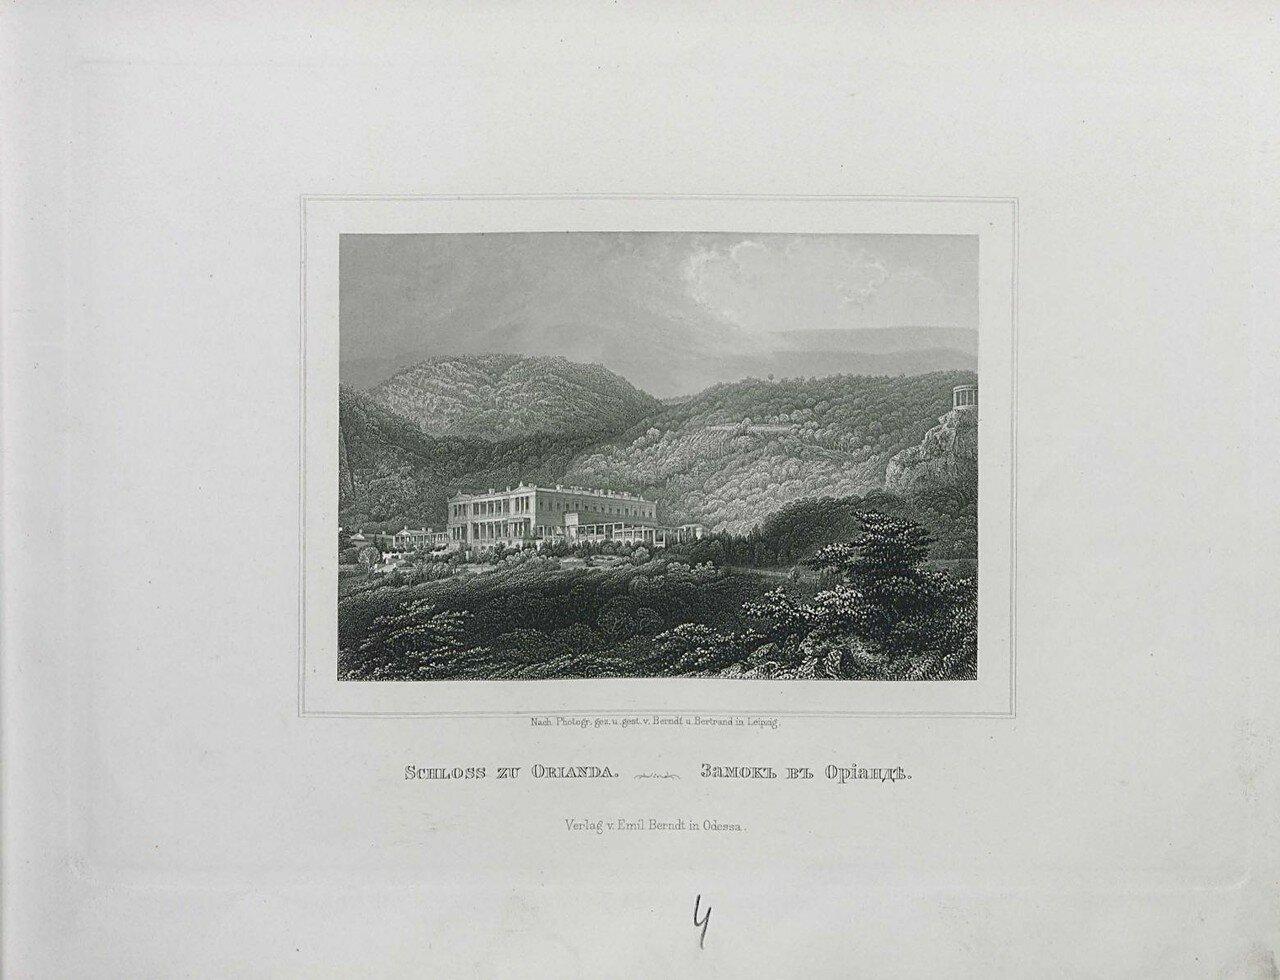 06. Замок в Орианде